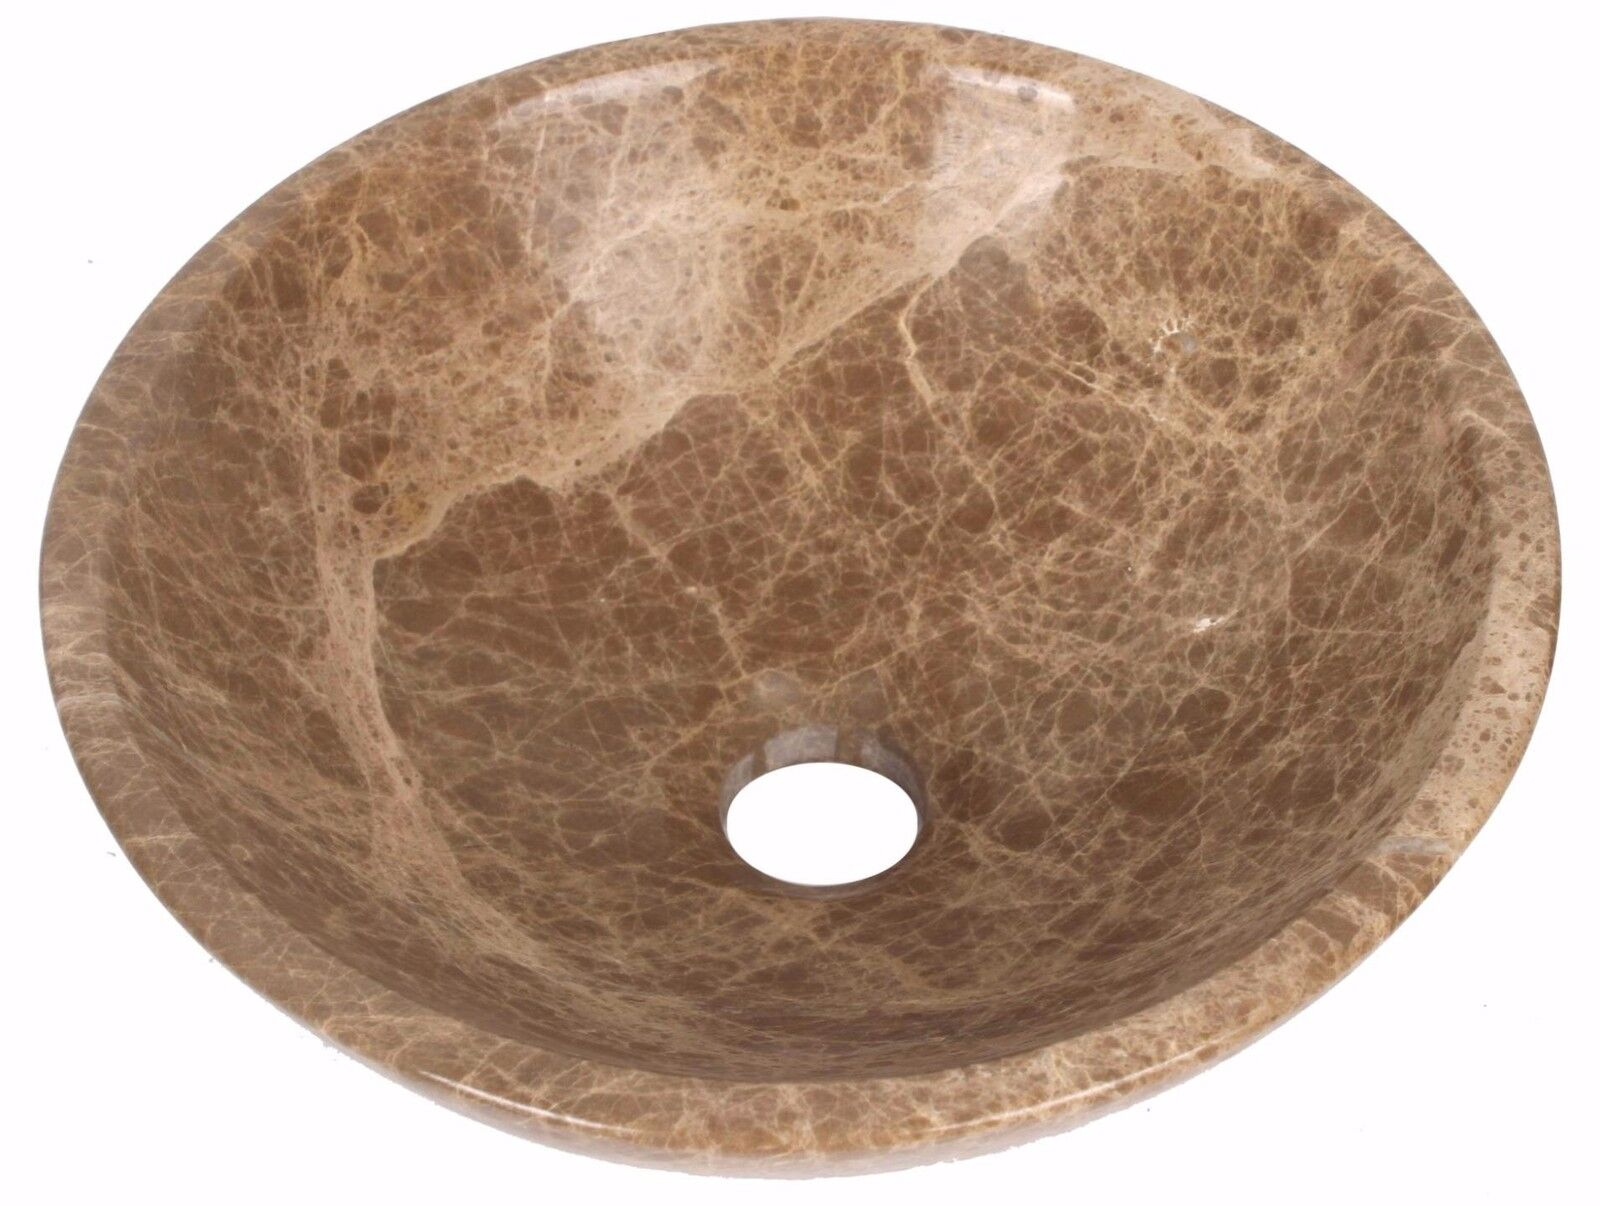 Marbre Main Visage Lavabo Bol Salle de Bain Diamètre 300 mm Lumière Emperador (0053)